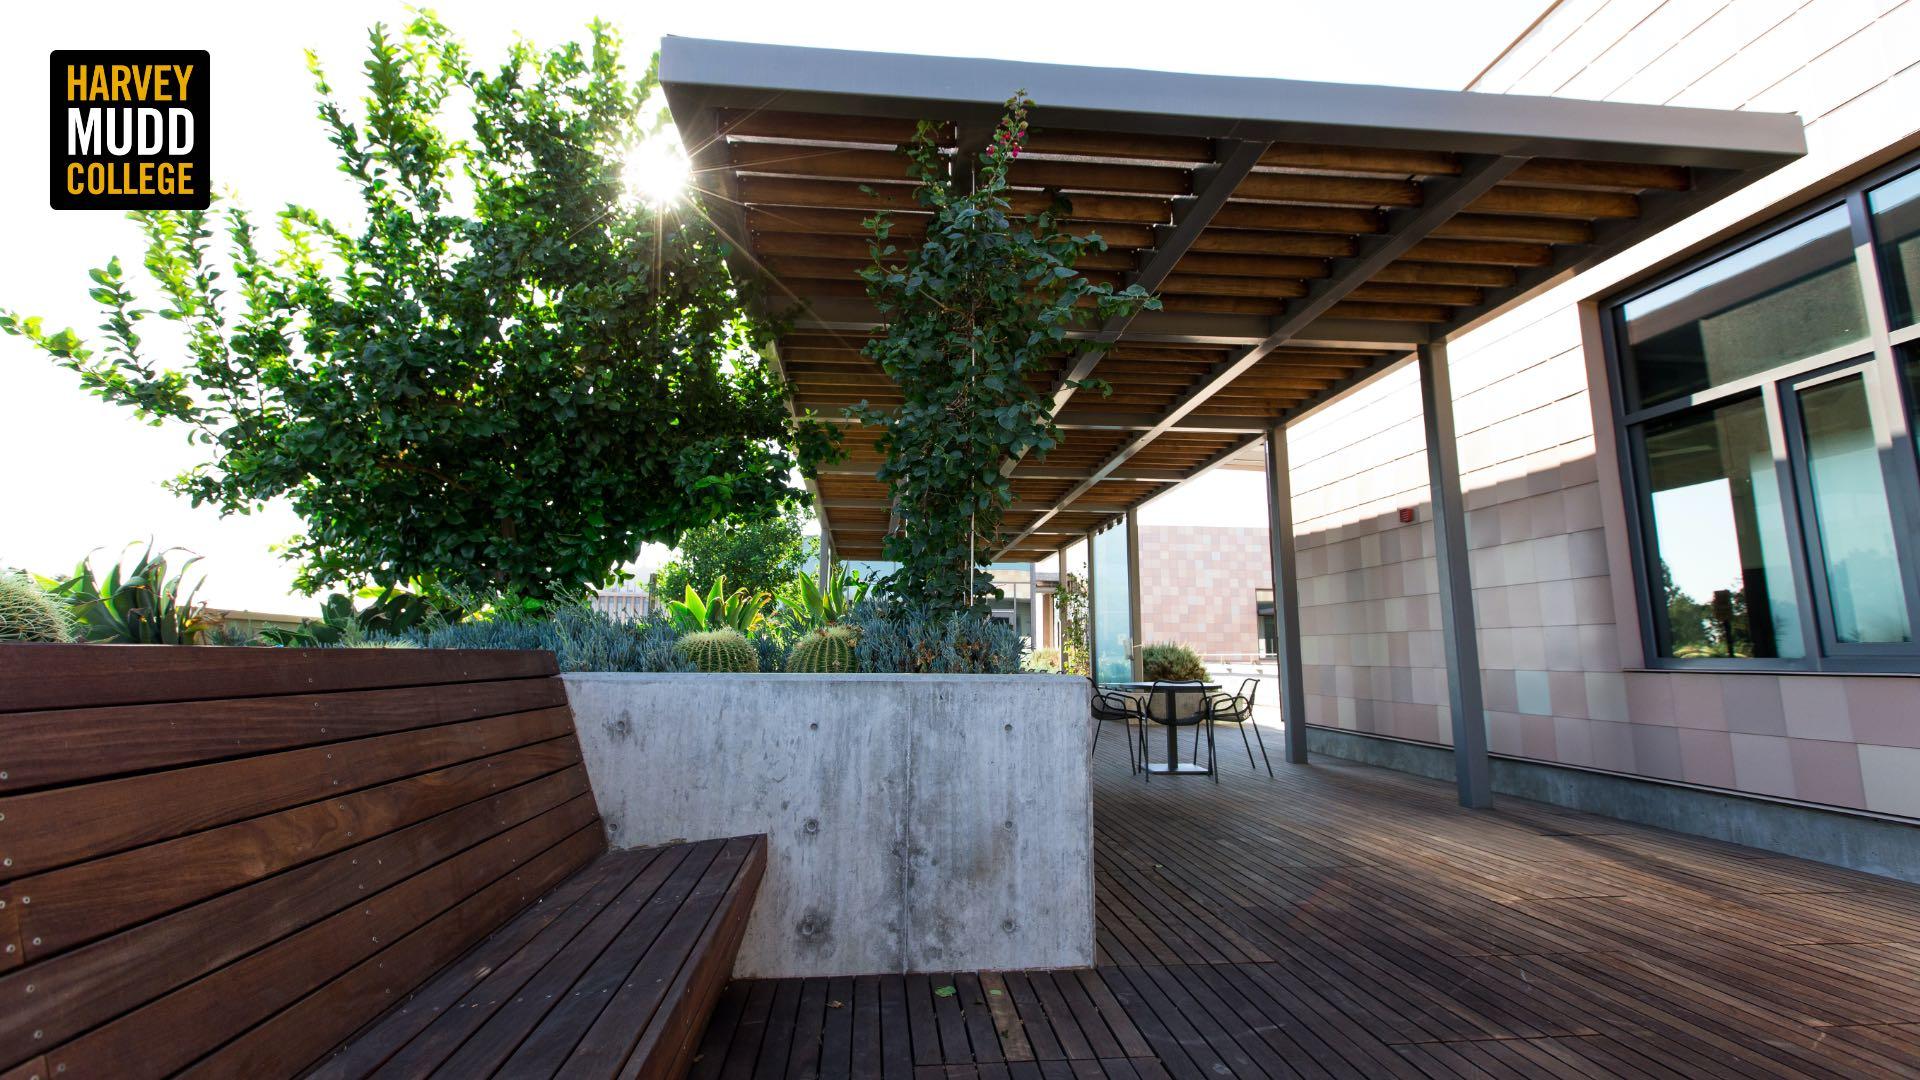 Outdoor classroom, Shanahan Center, Harvey Mudd College